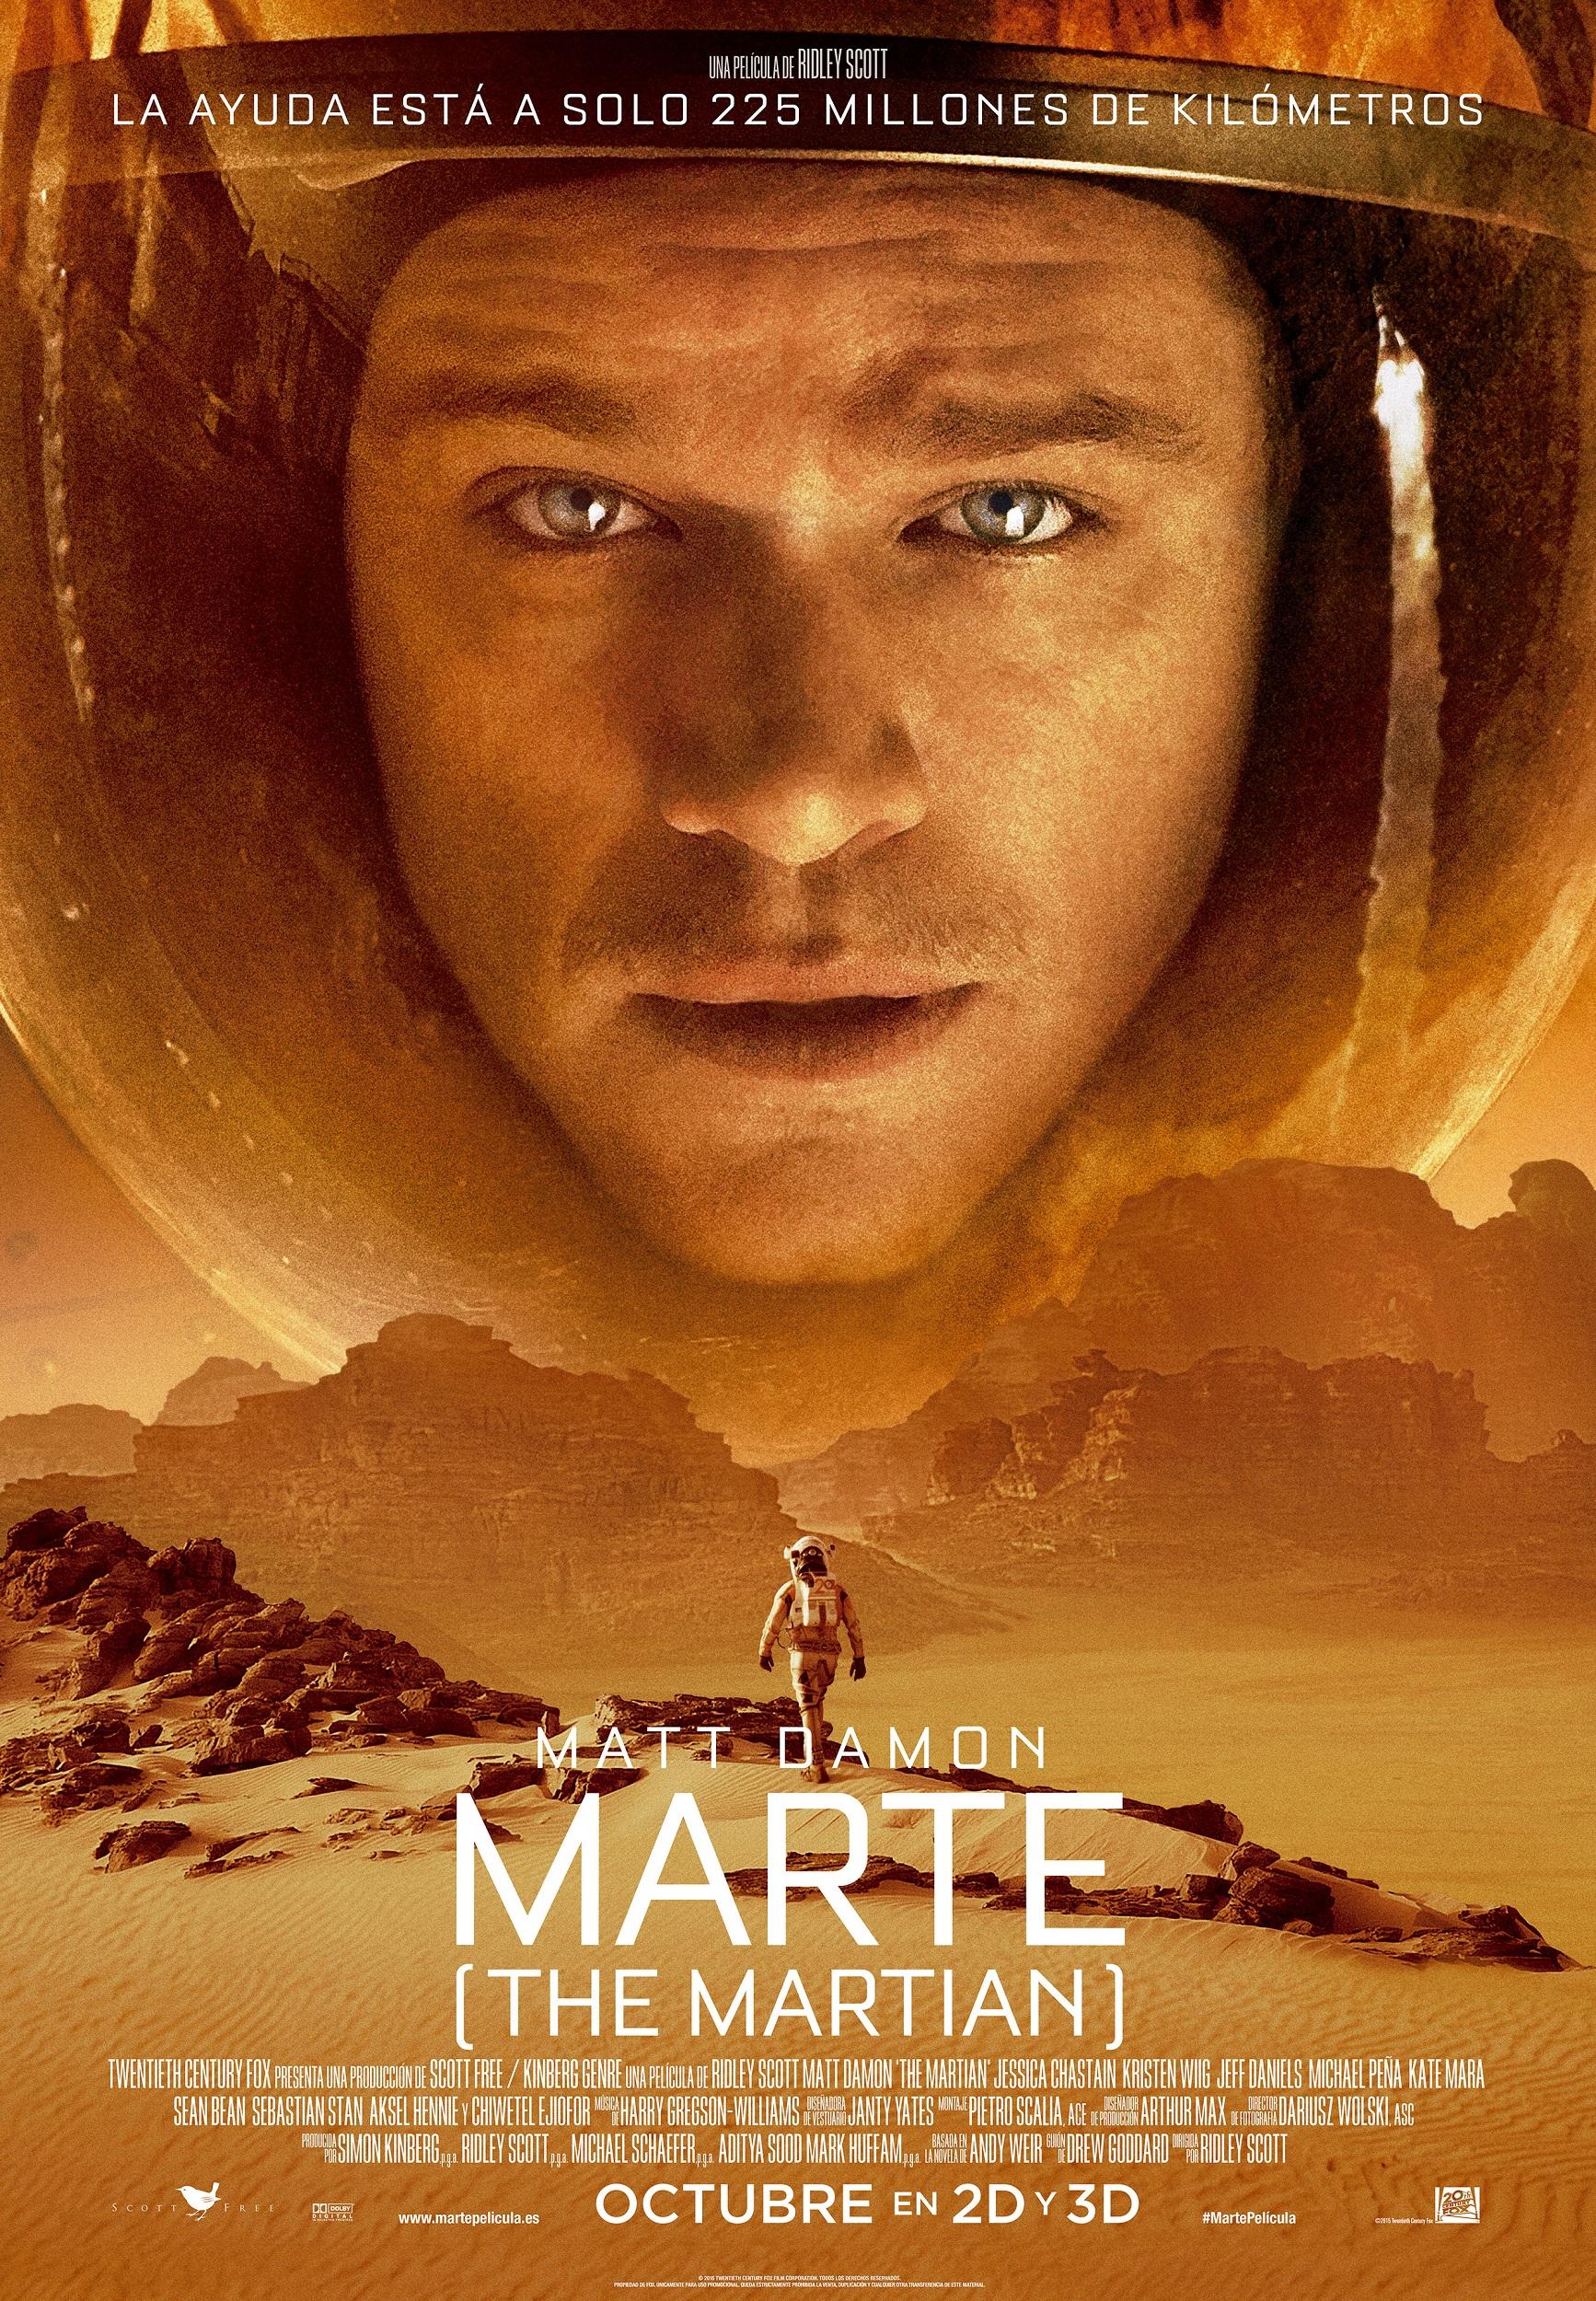 Marte The Martian Cartel